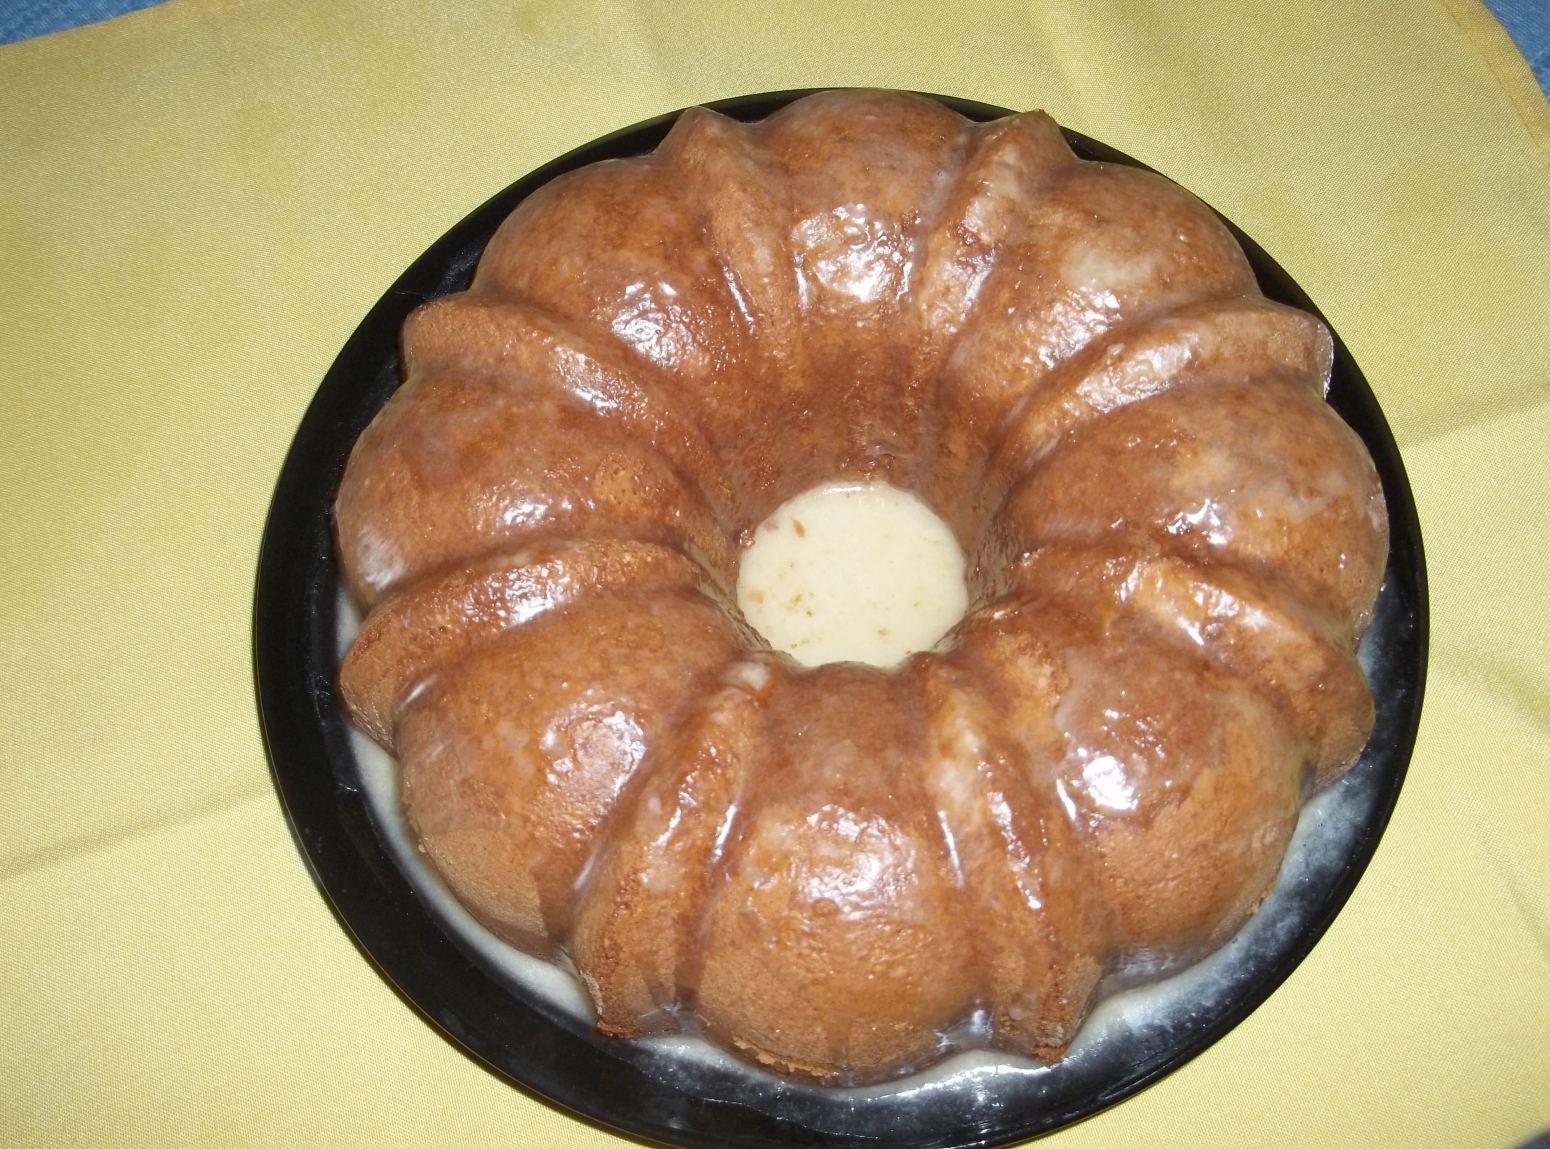 Apricot Nectar Cake Recipe Lemon Jello: GOLDIE'S APRICOT NECTAR CAKE (SALLYE) Recipe